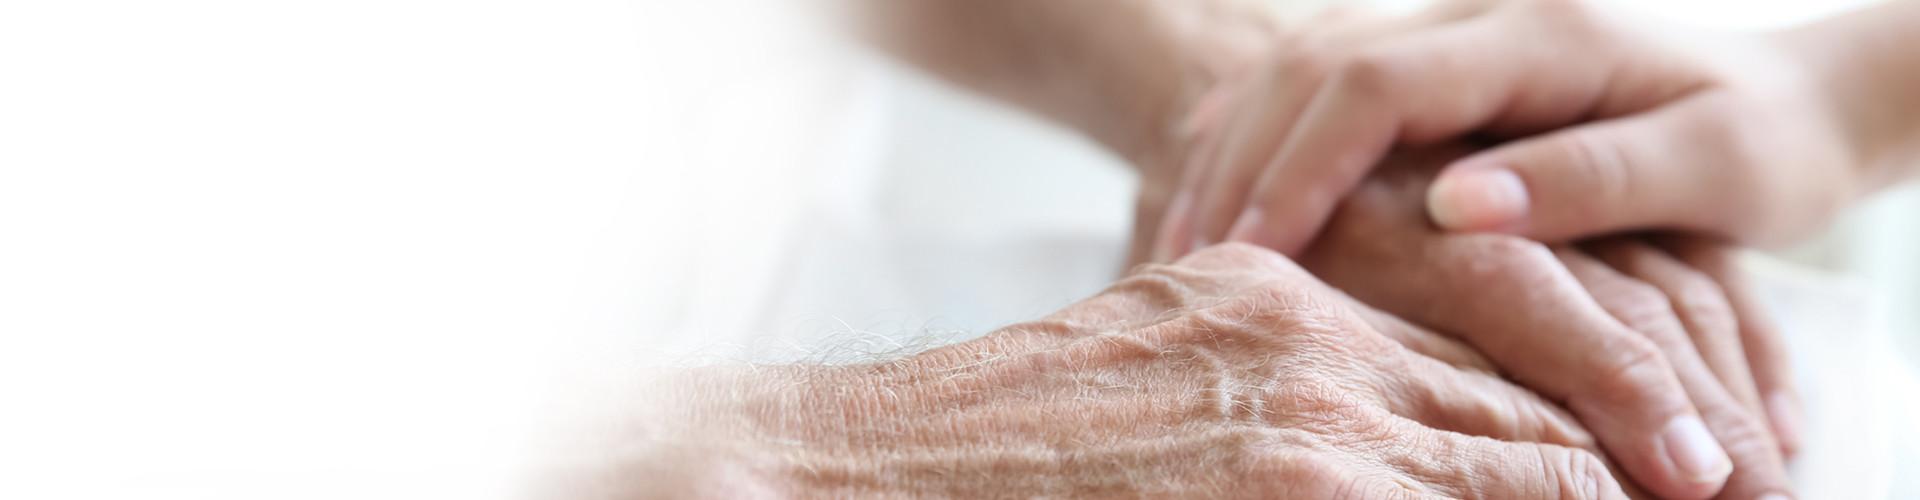 Junge Hand berührt ältere Hände © Africa Studio/stock.adobe.com, AK Stmk